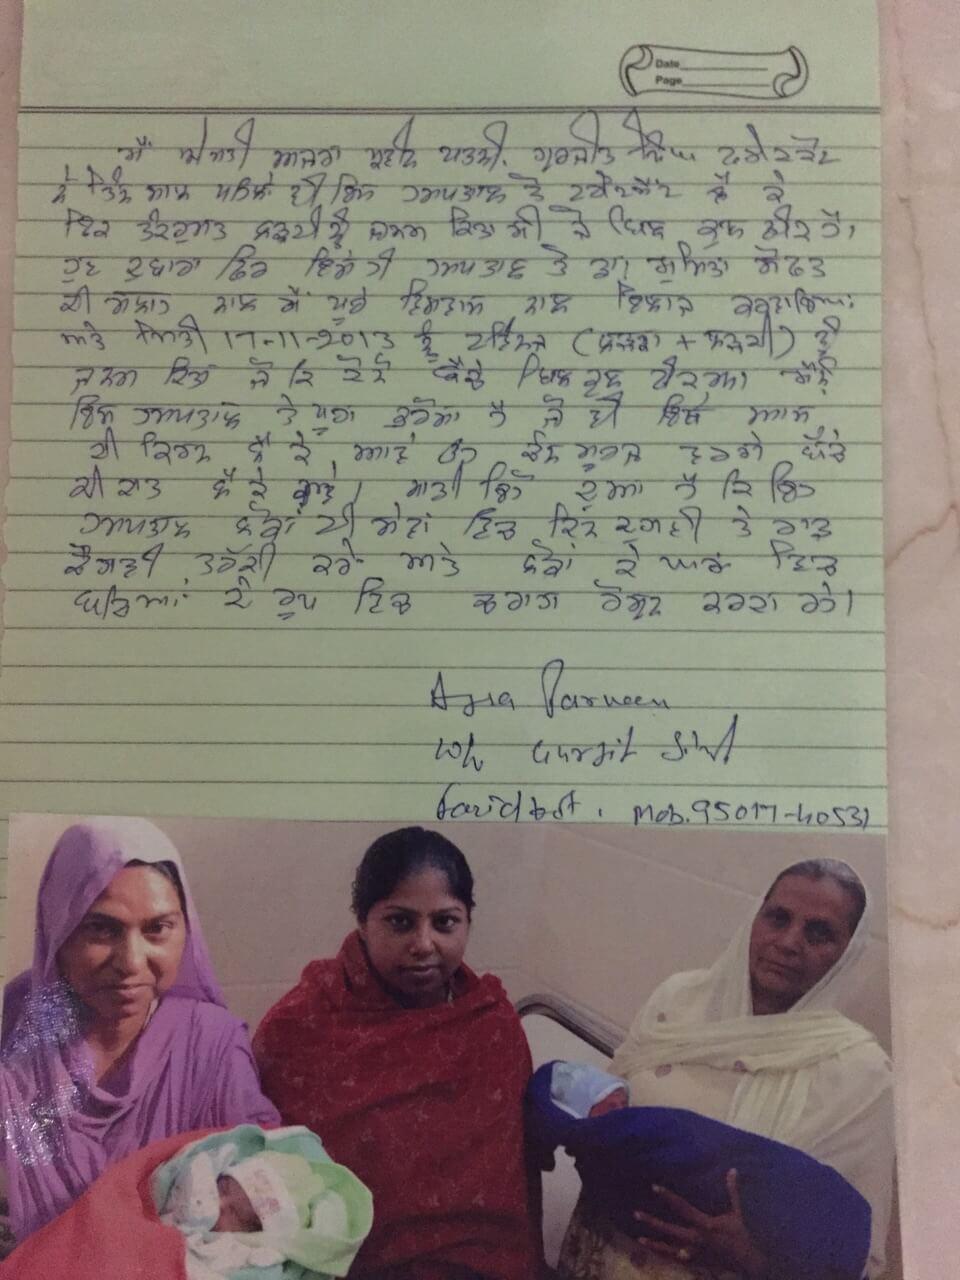 Gurjit-Singh-Ajra-Parveen